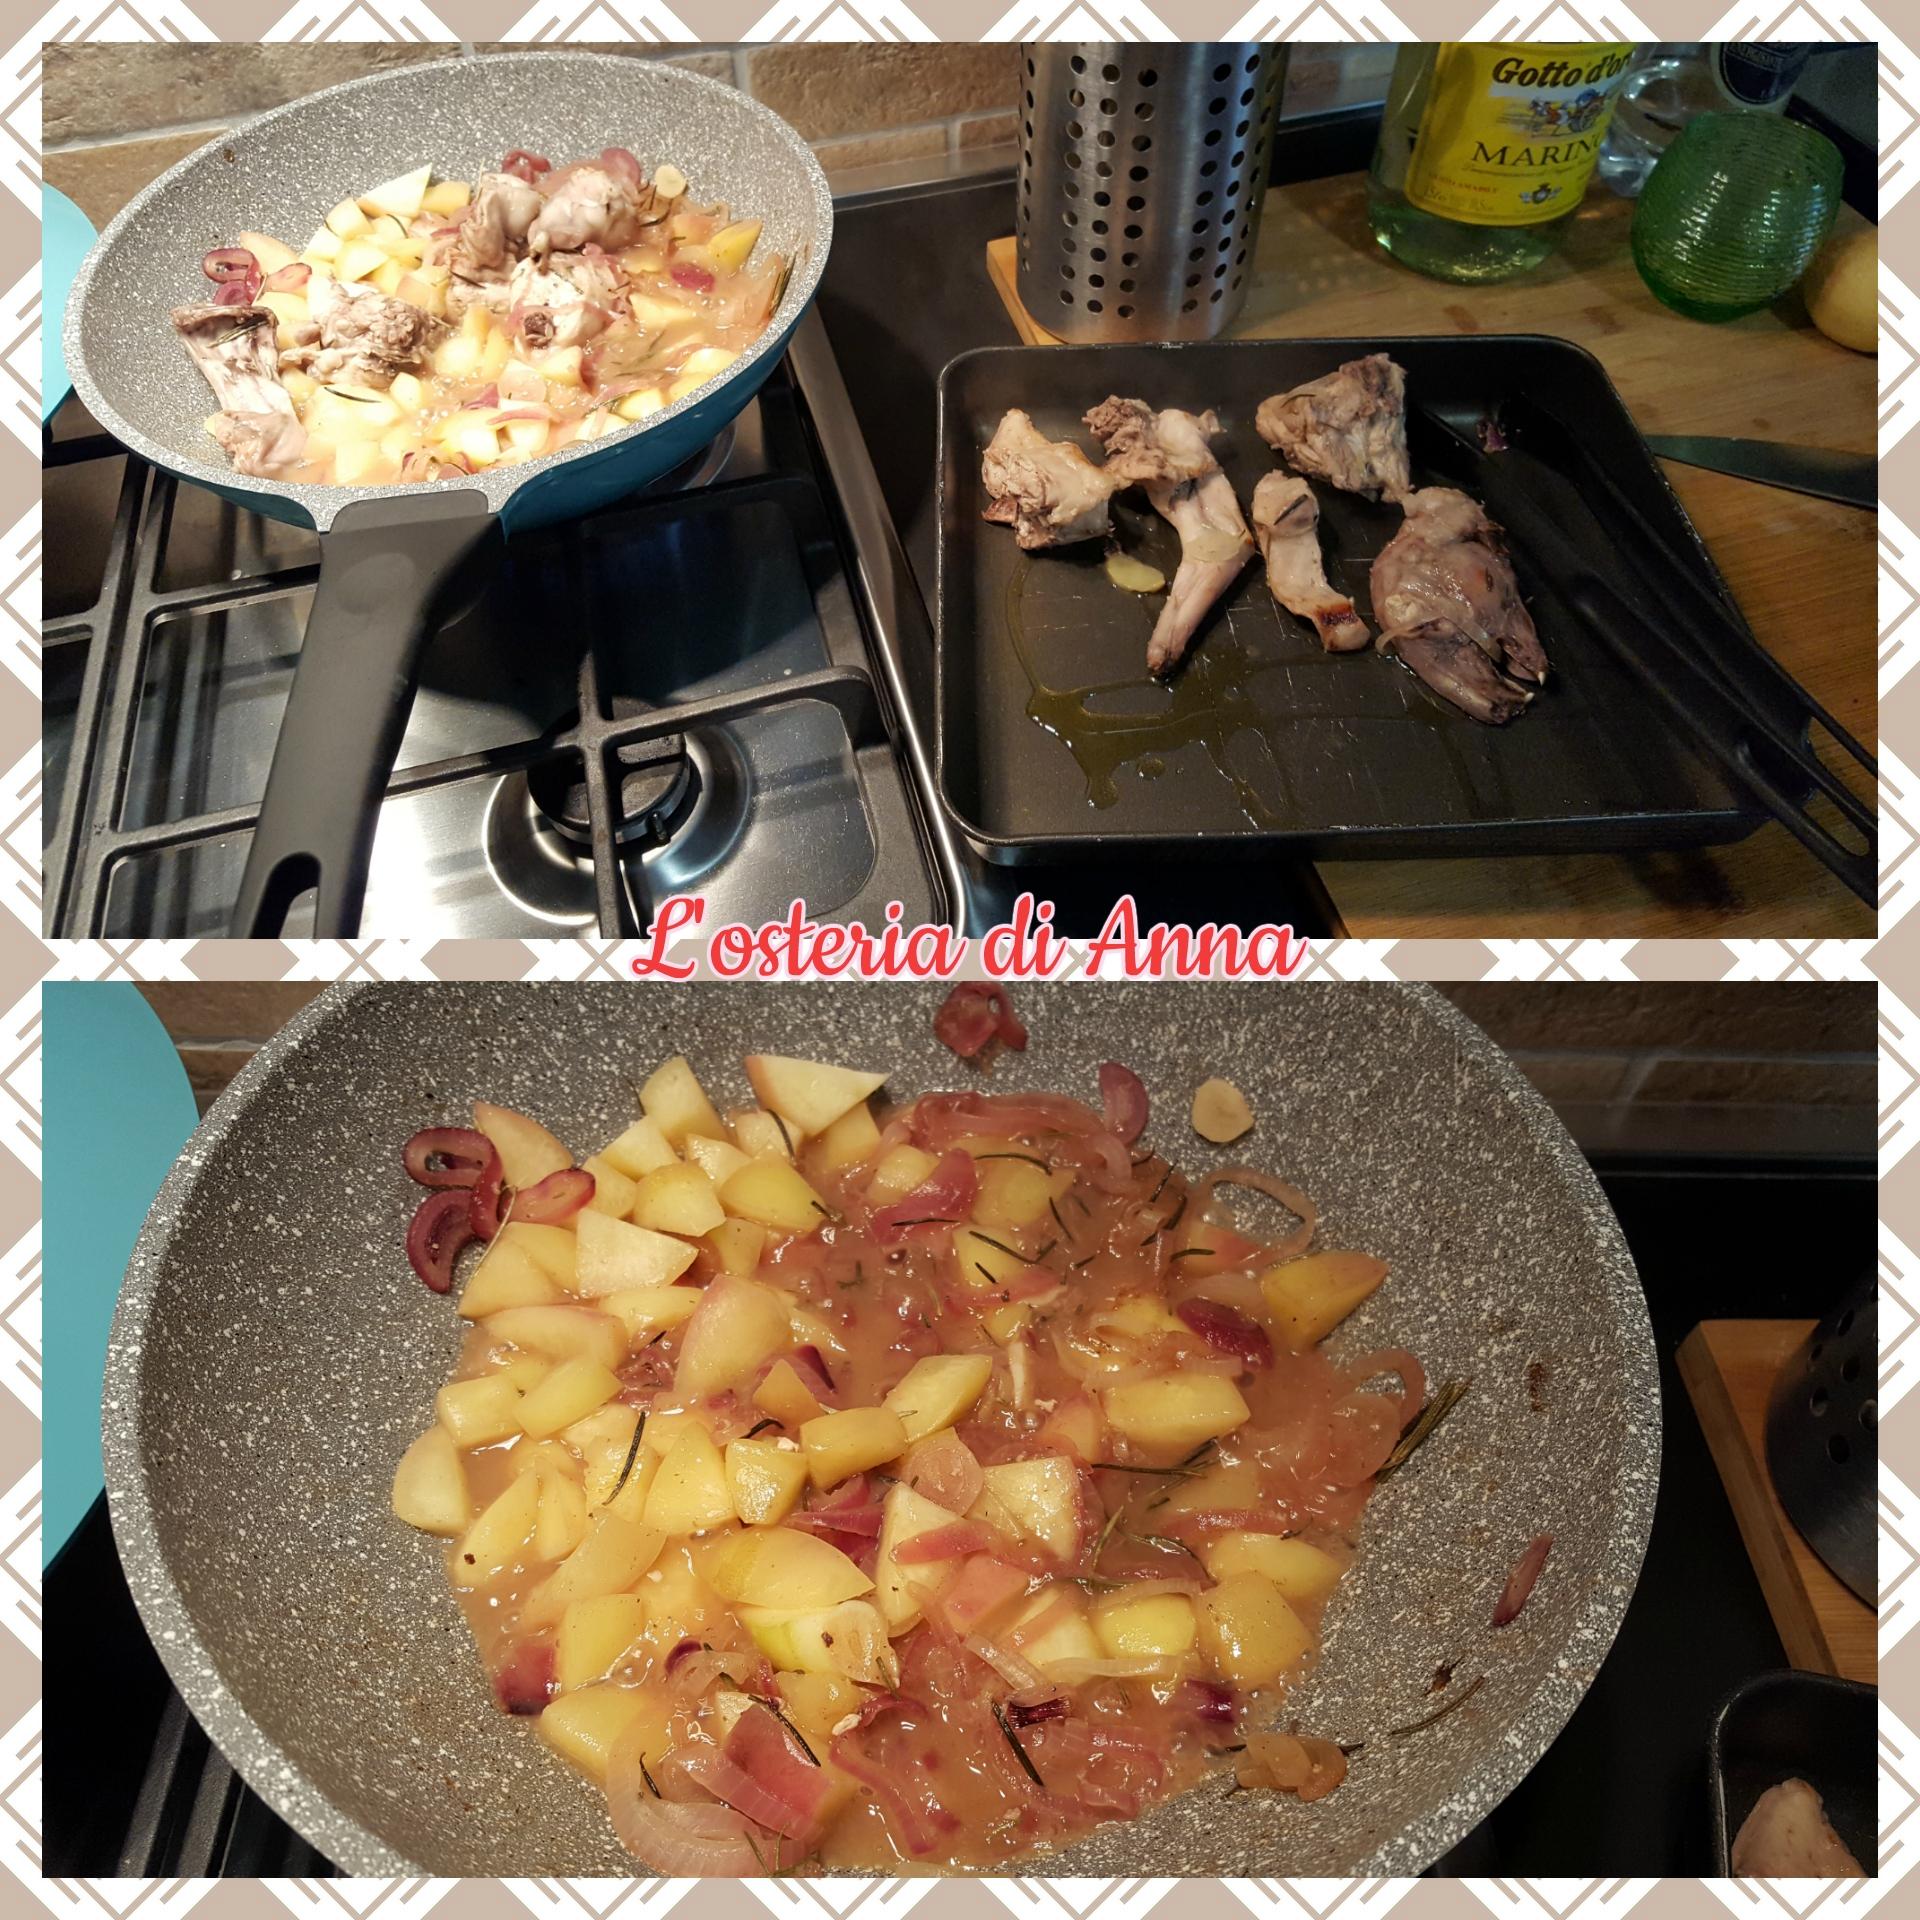 Cottura delle cipolle e delle merendelle